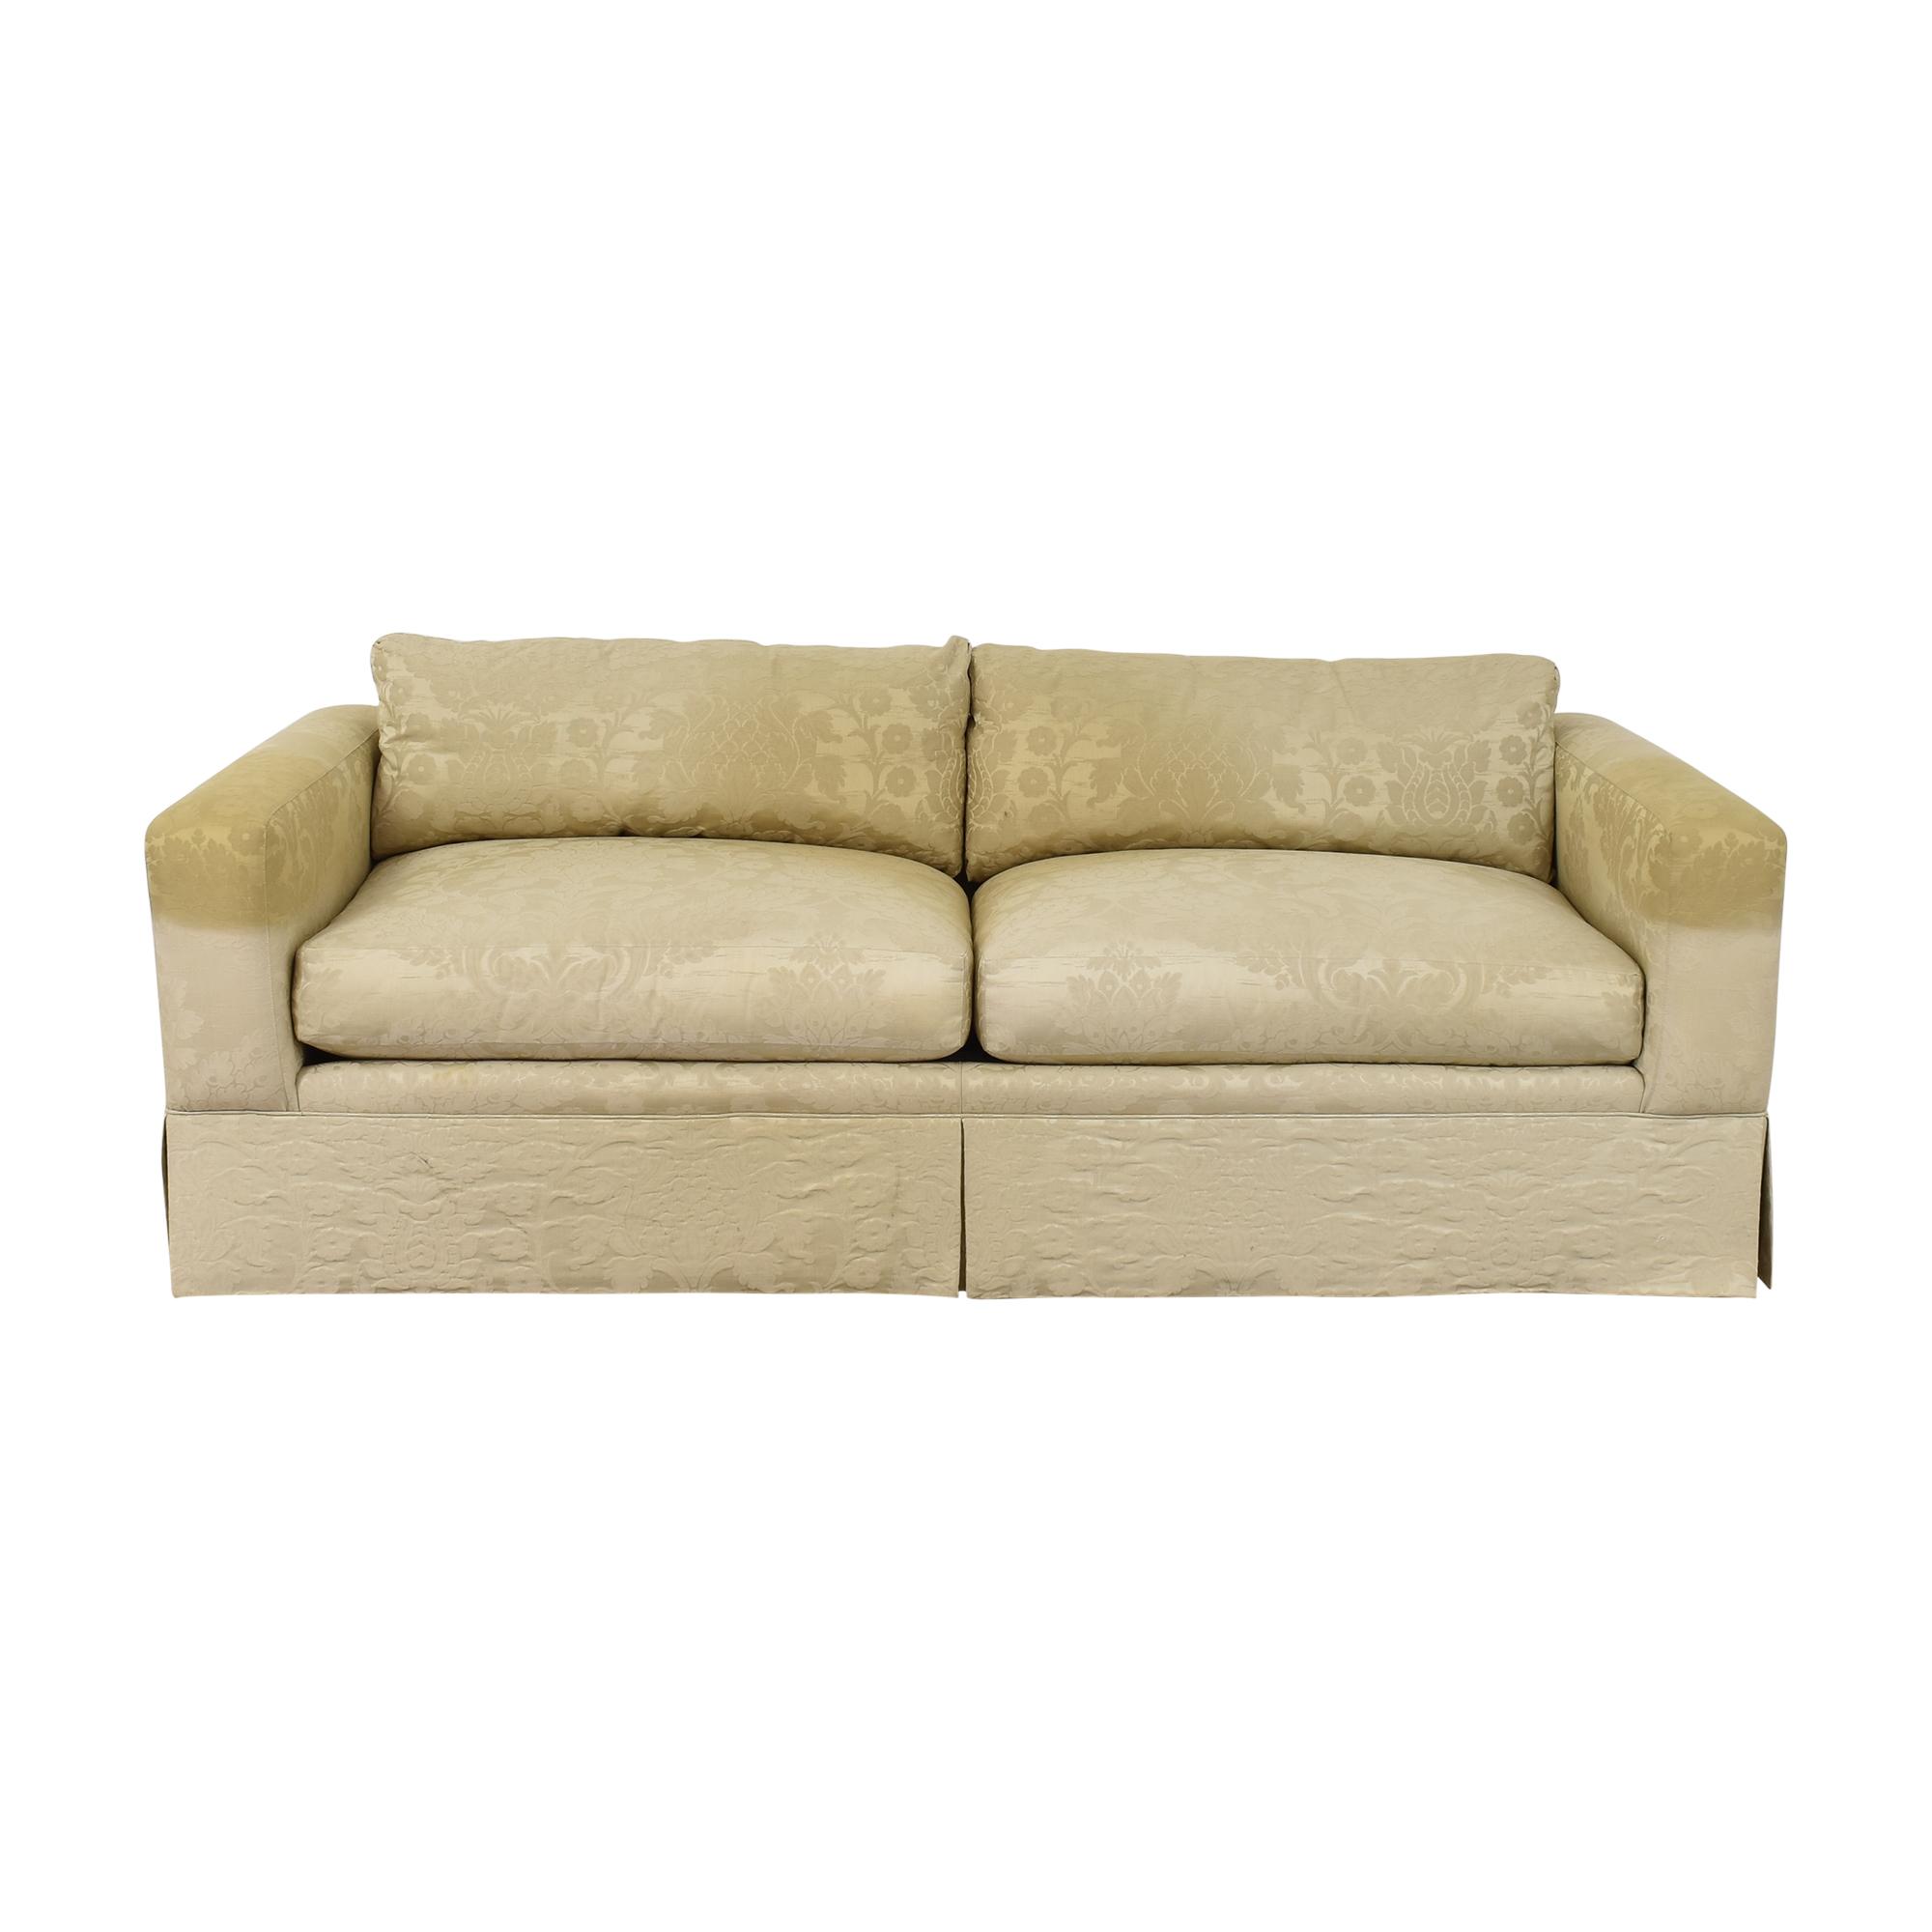 Baker Furniture Baker Furniture Two Cushion Skirted Sofa second hand